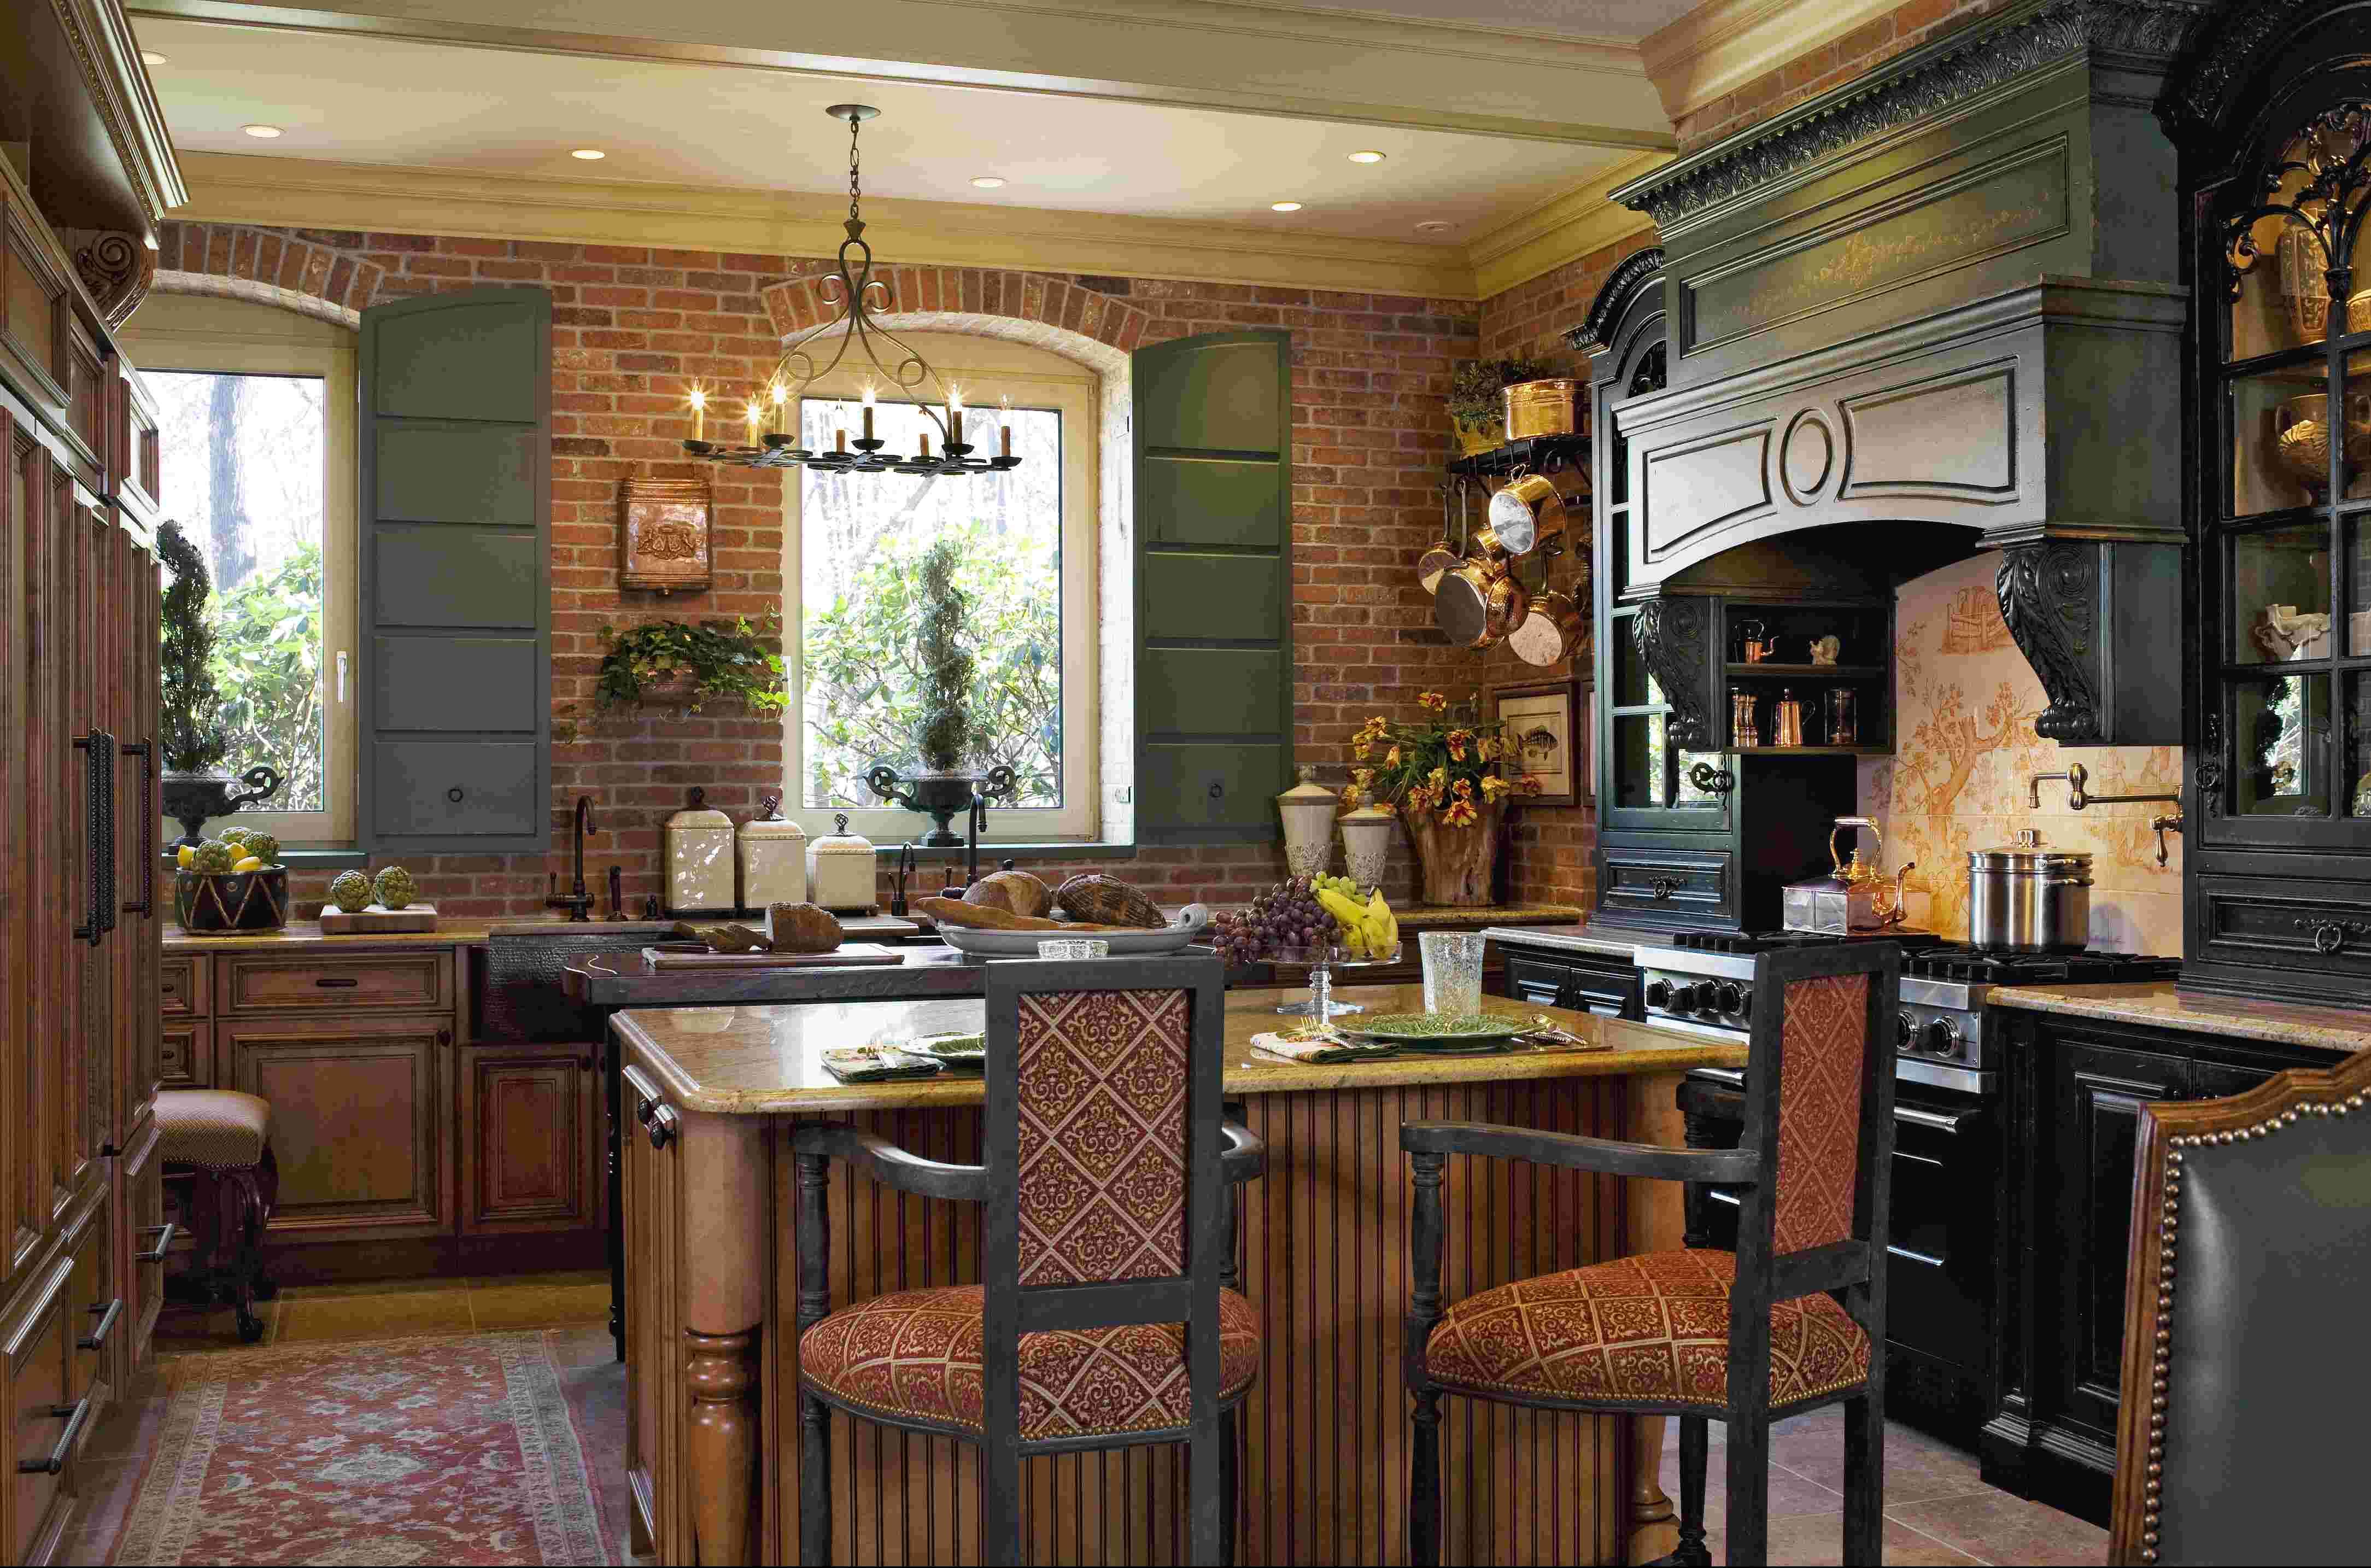 2012 Ellis Boston Antiques Show Features Guest Speaker Sally Wilson ASID of the Award Winning Boston Interior Design Firm Wilson Kelsey Design